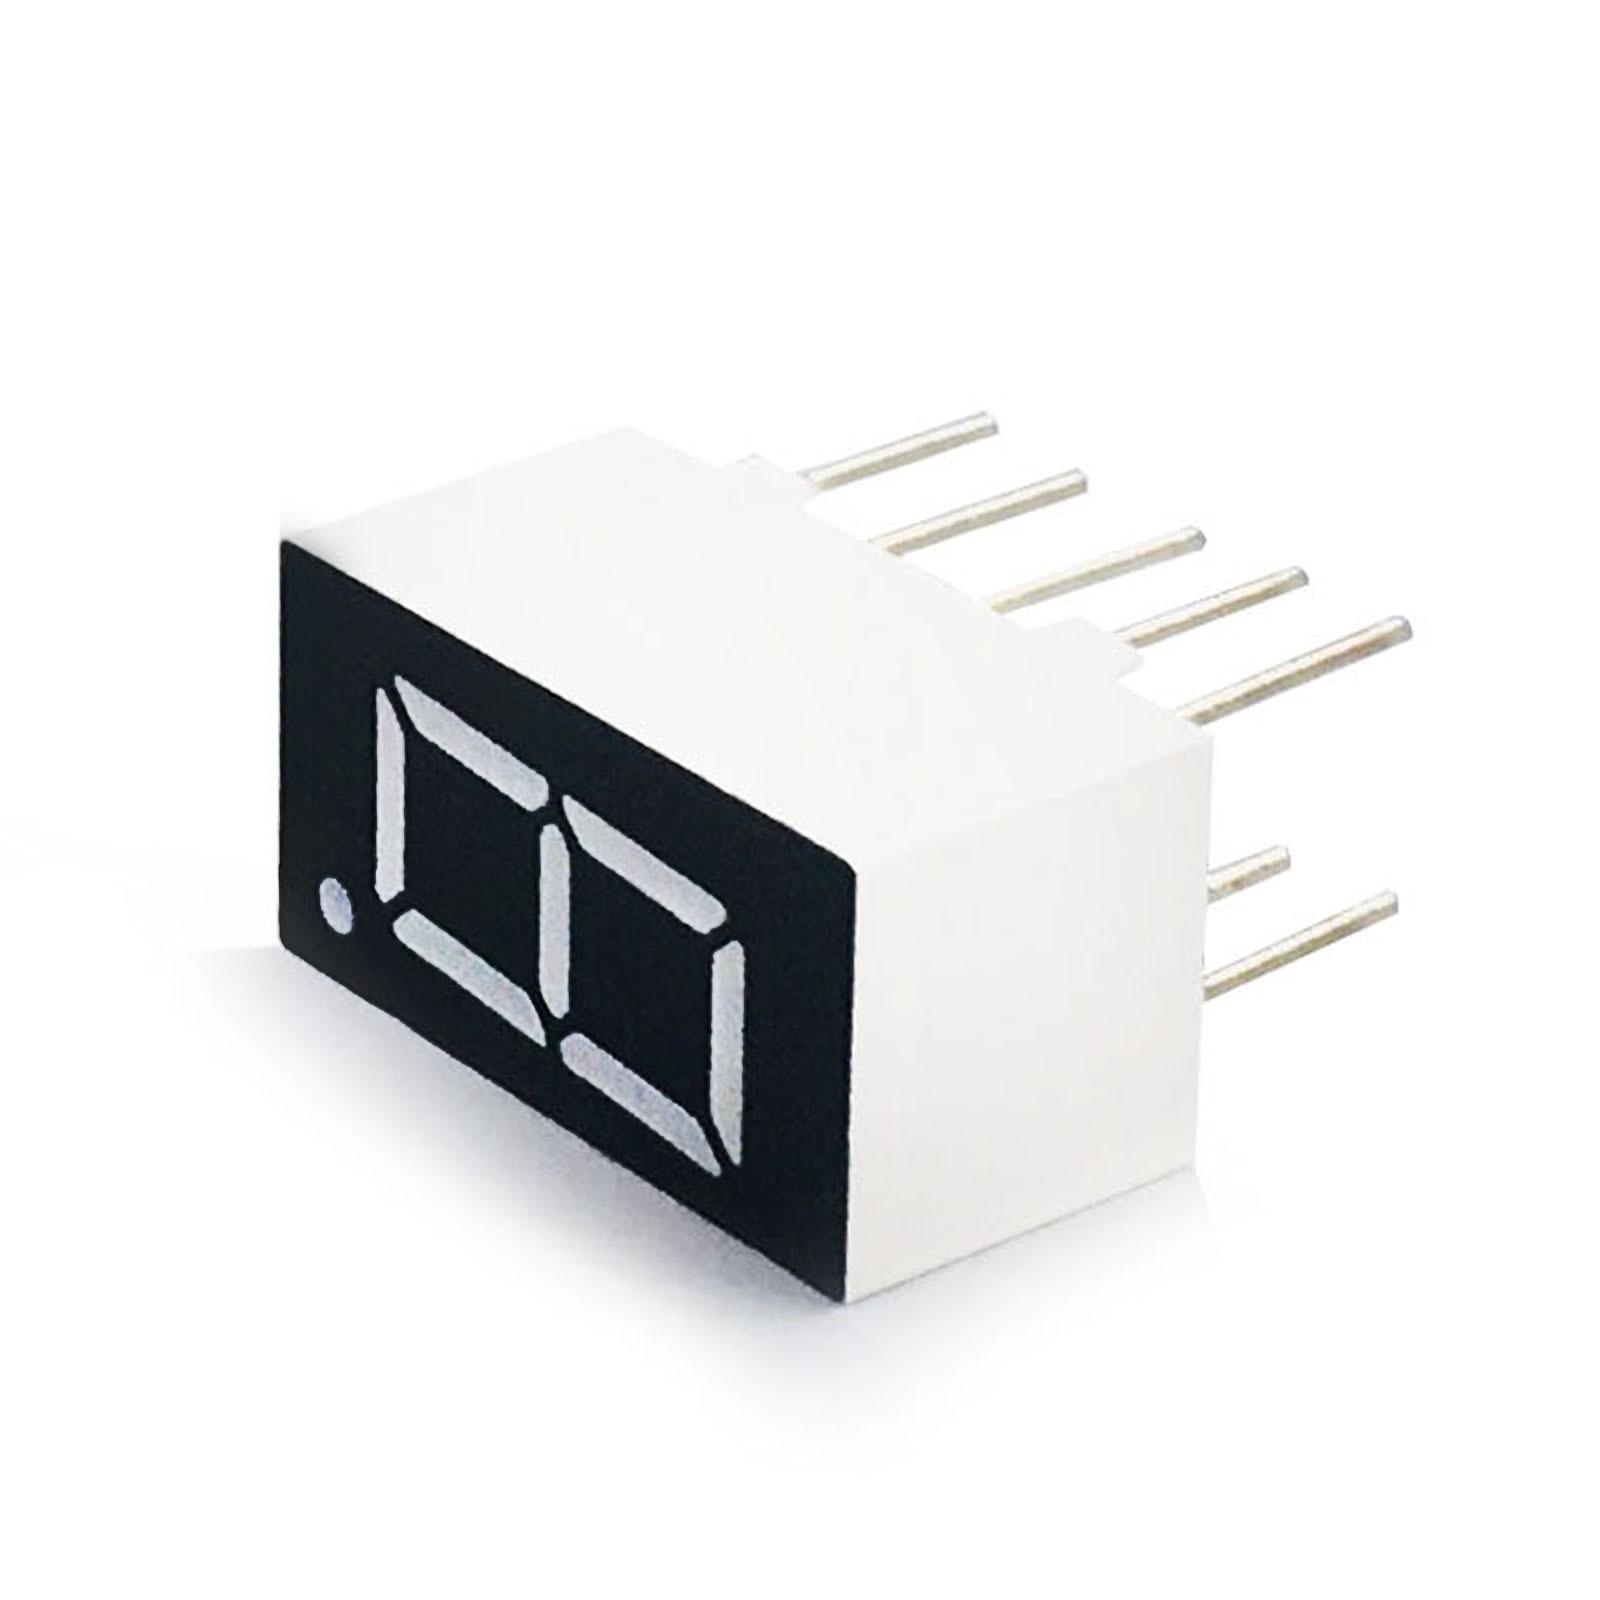 "YELLOW 7 segment LED display common Anode Large 10cm 4/"" inch EU seller"